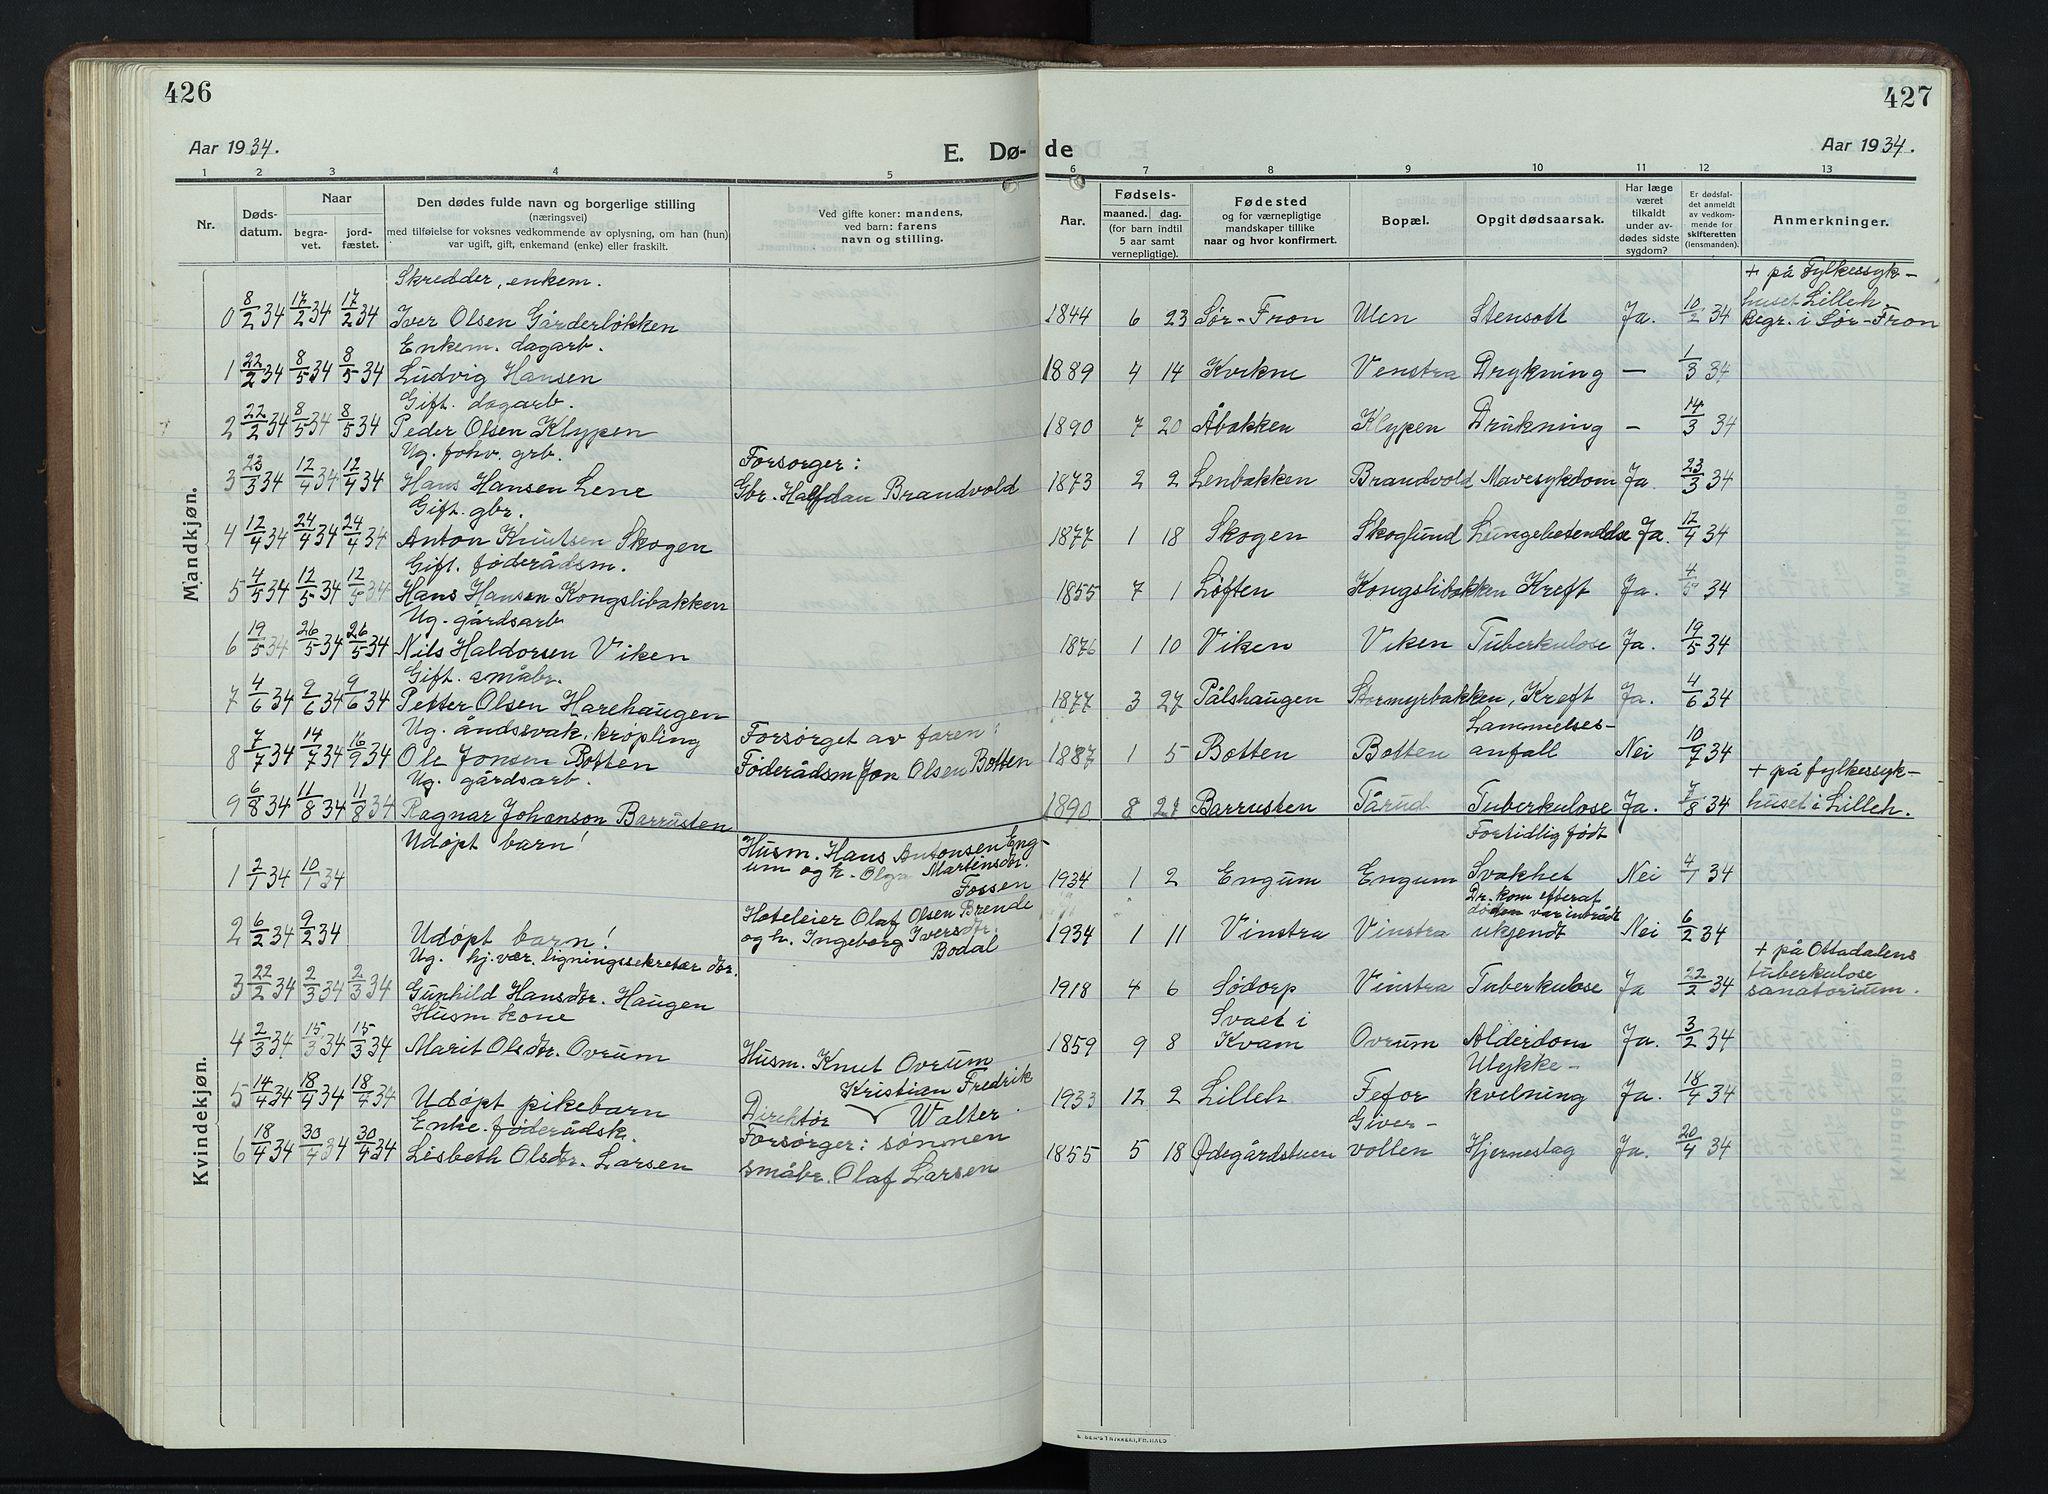 SAH, Nord-Fron prestekontor, Klokkerbok nr. 7, 1915-1946, s. 426-427